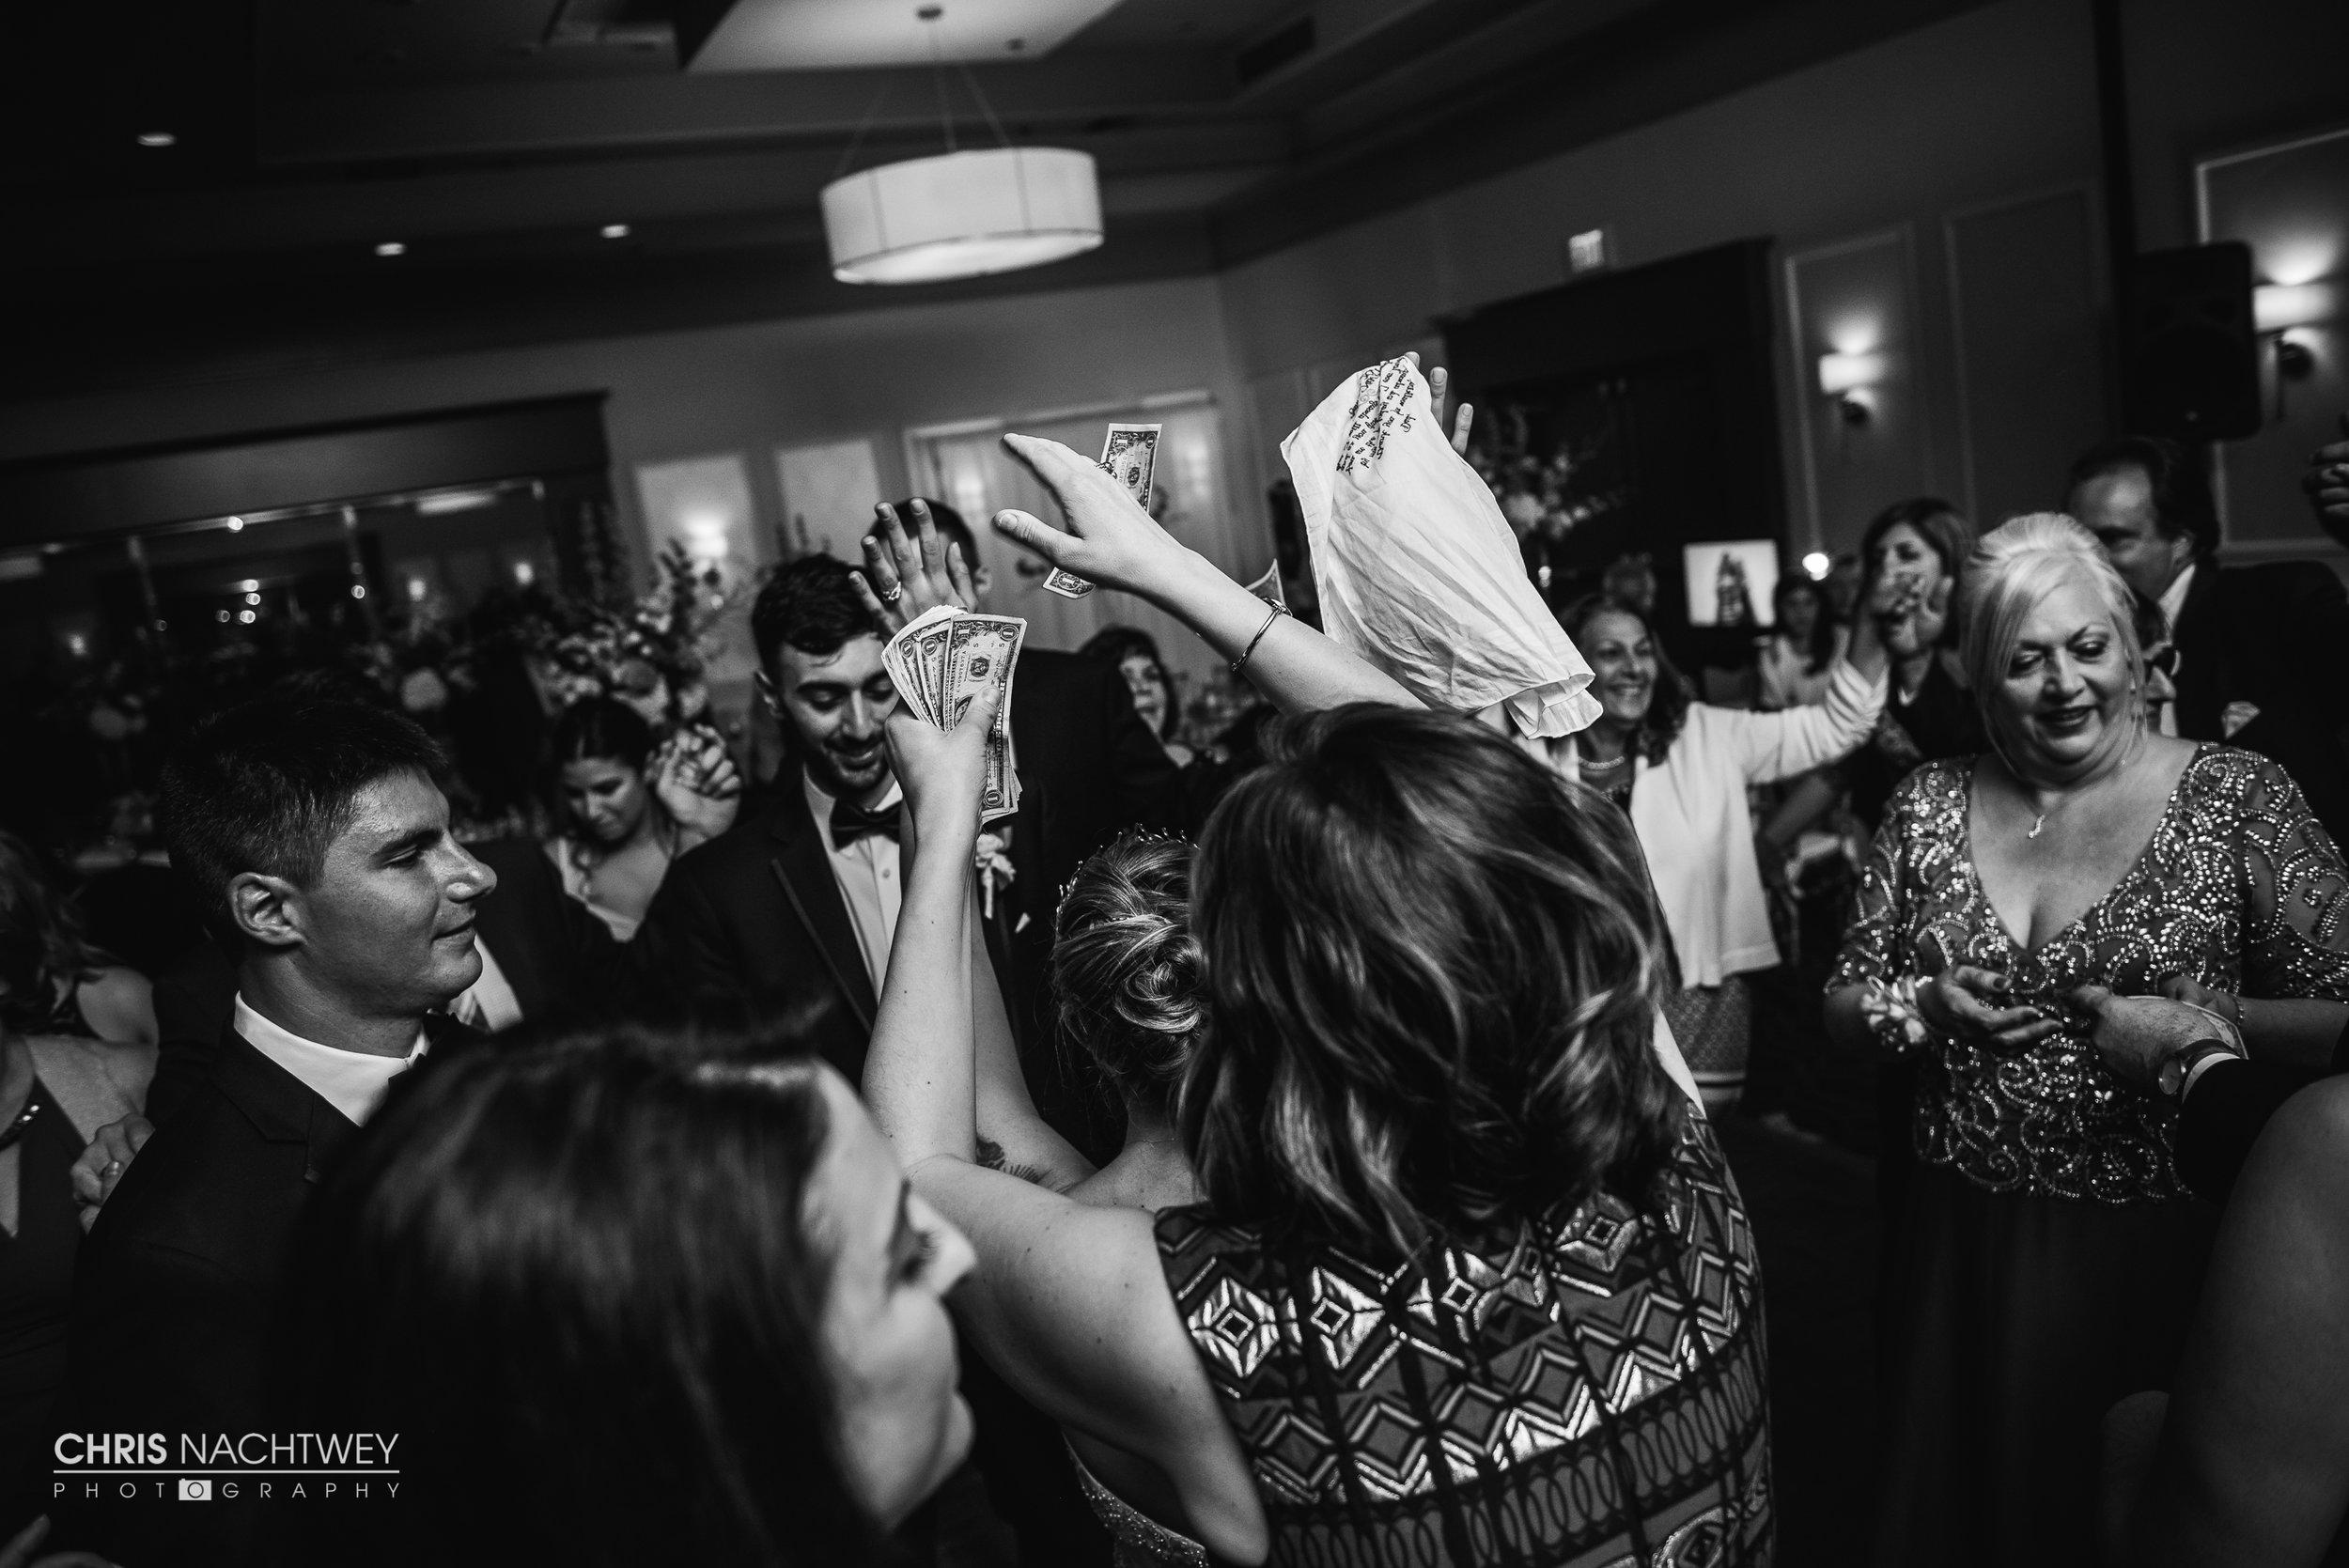 hilton-in-mystic-ct-wedding-photographer-chris-nachtwey-2017-25.jpg